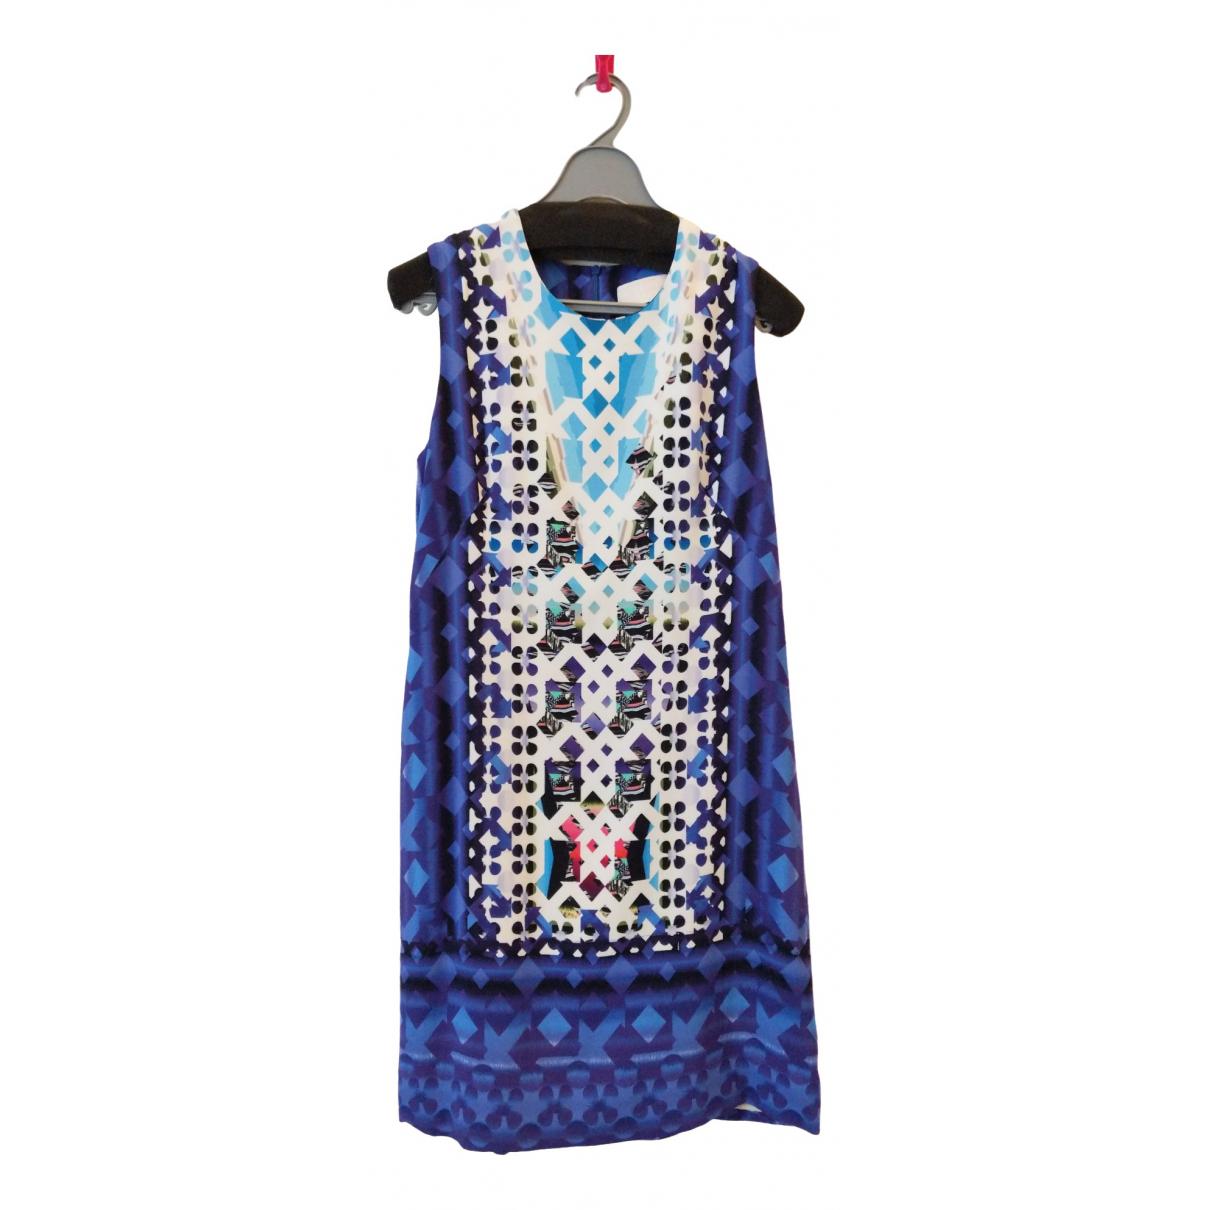 Peter Pilotto \N Purple dress for Women 6 US